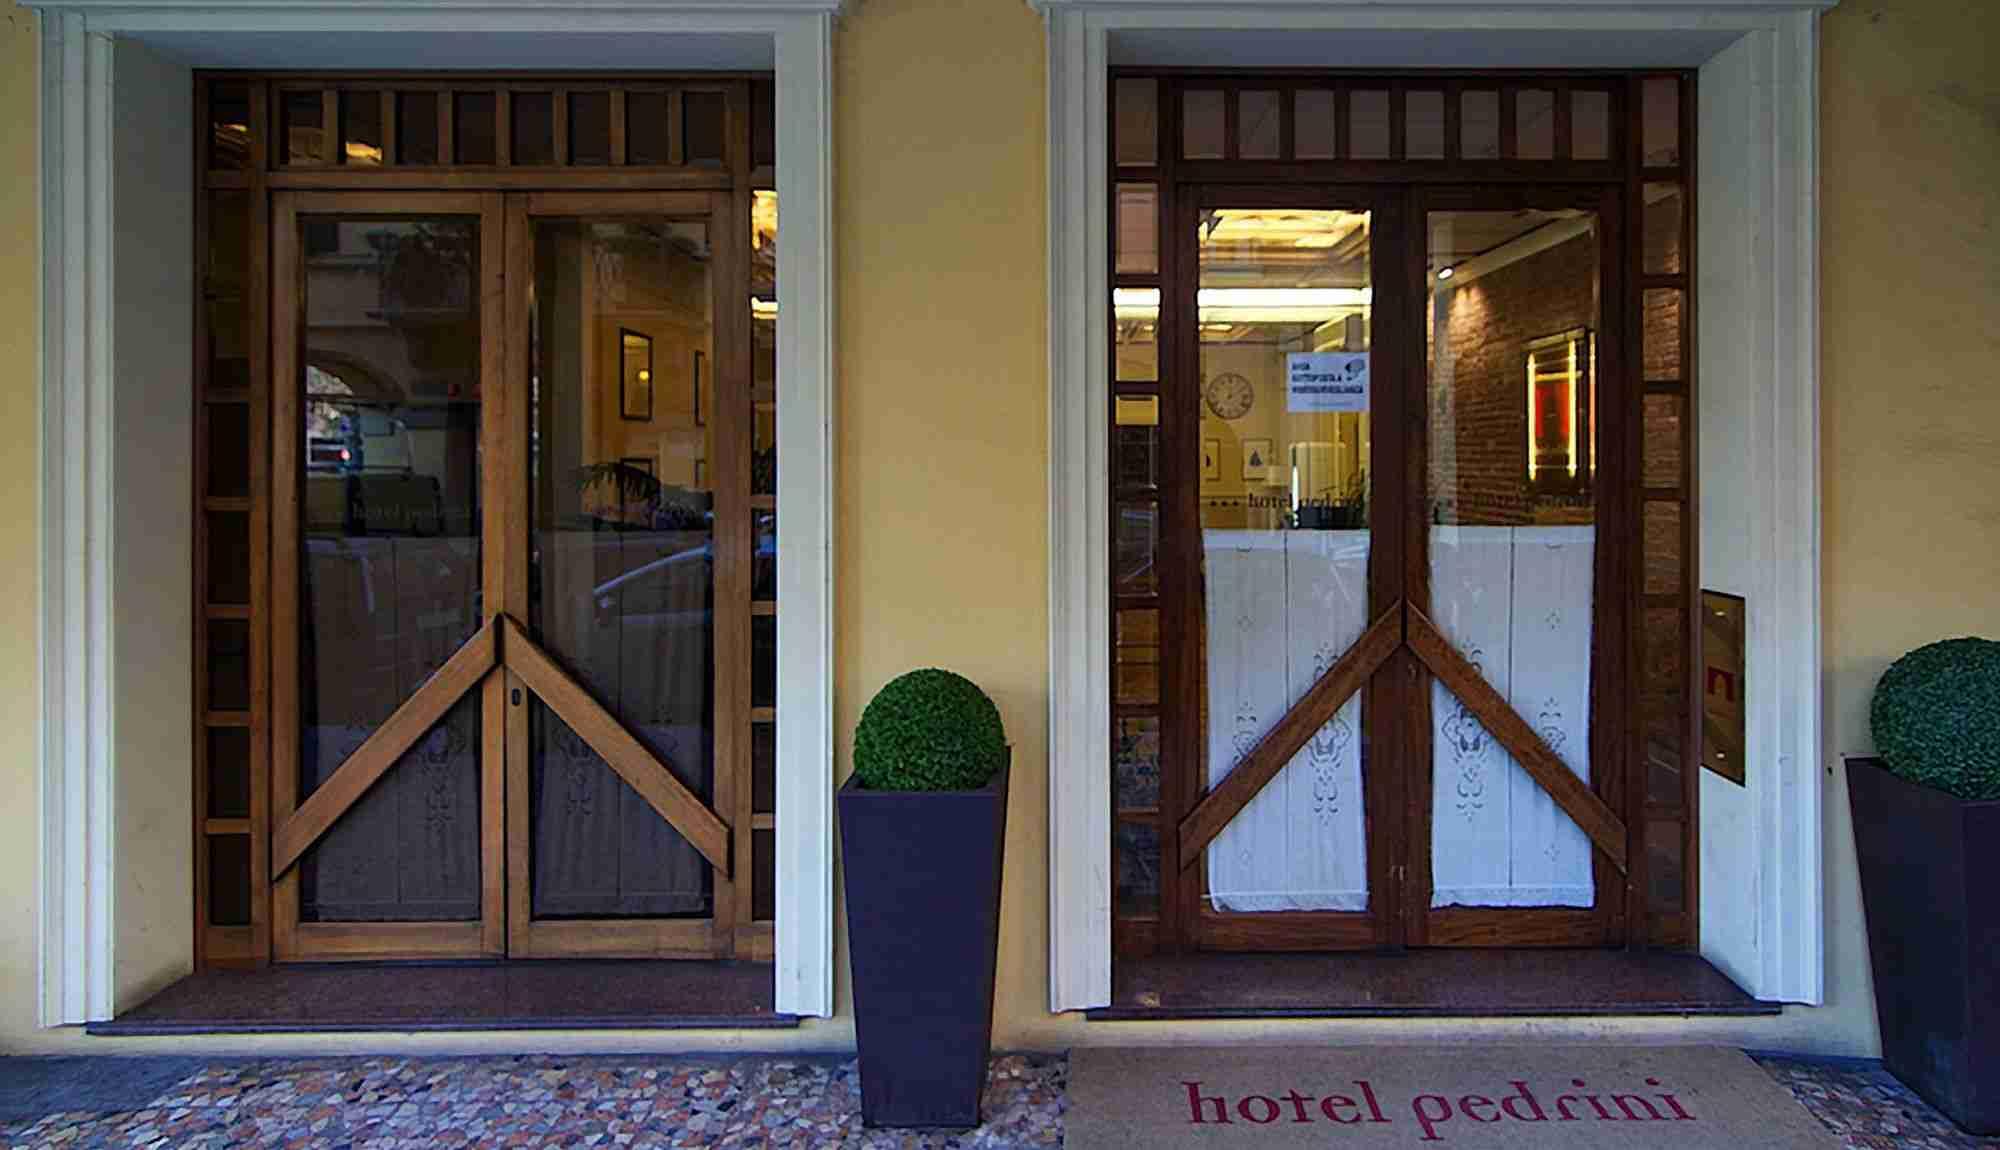 slider-hotel-pedrini-3